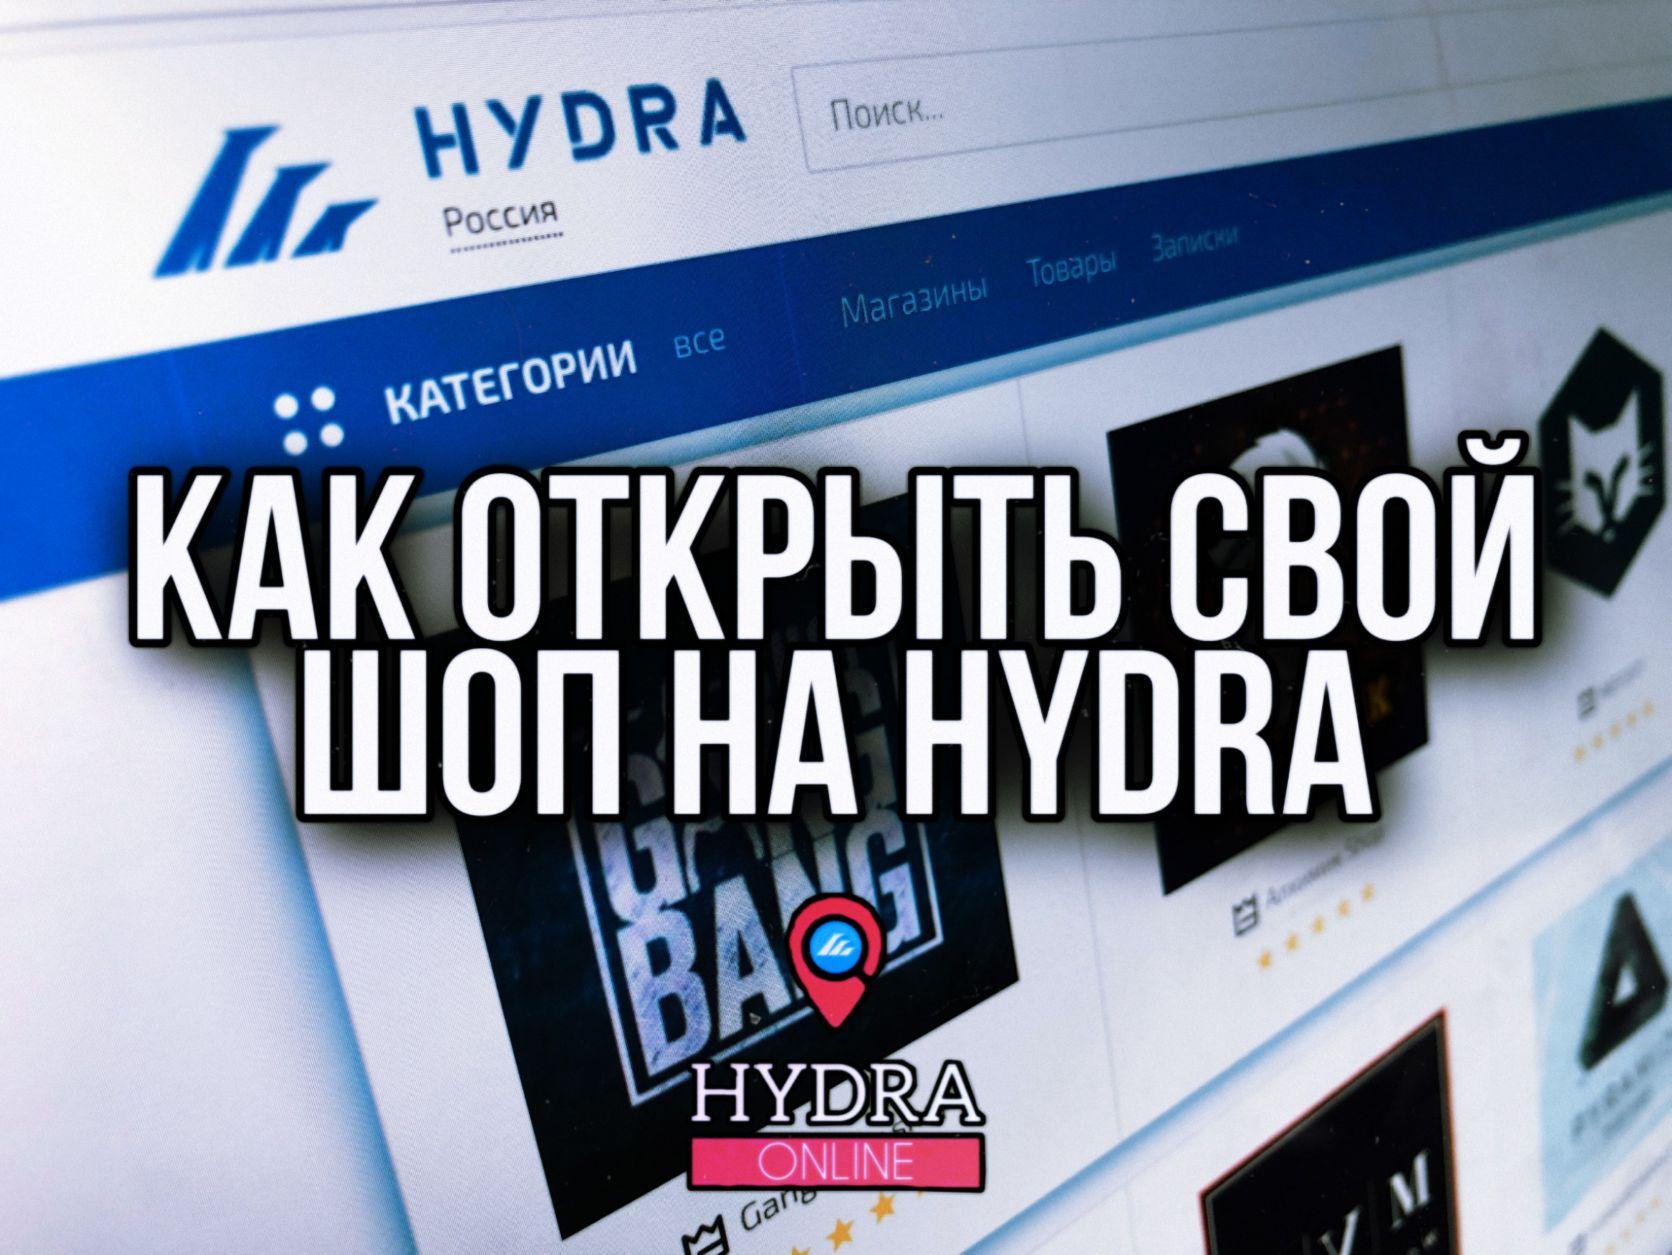 Лента статья про даркнет hudra русскоязычный тор браузер gidra